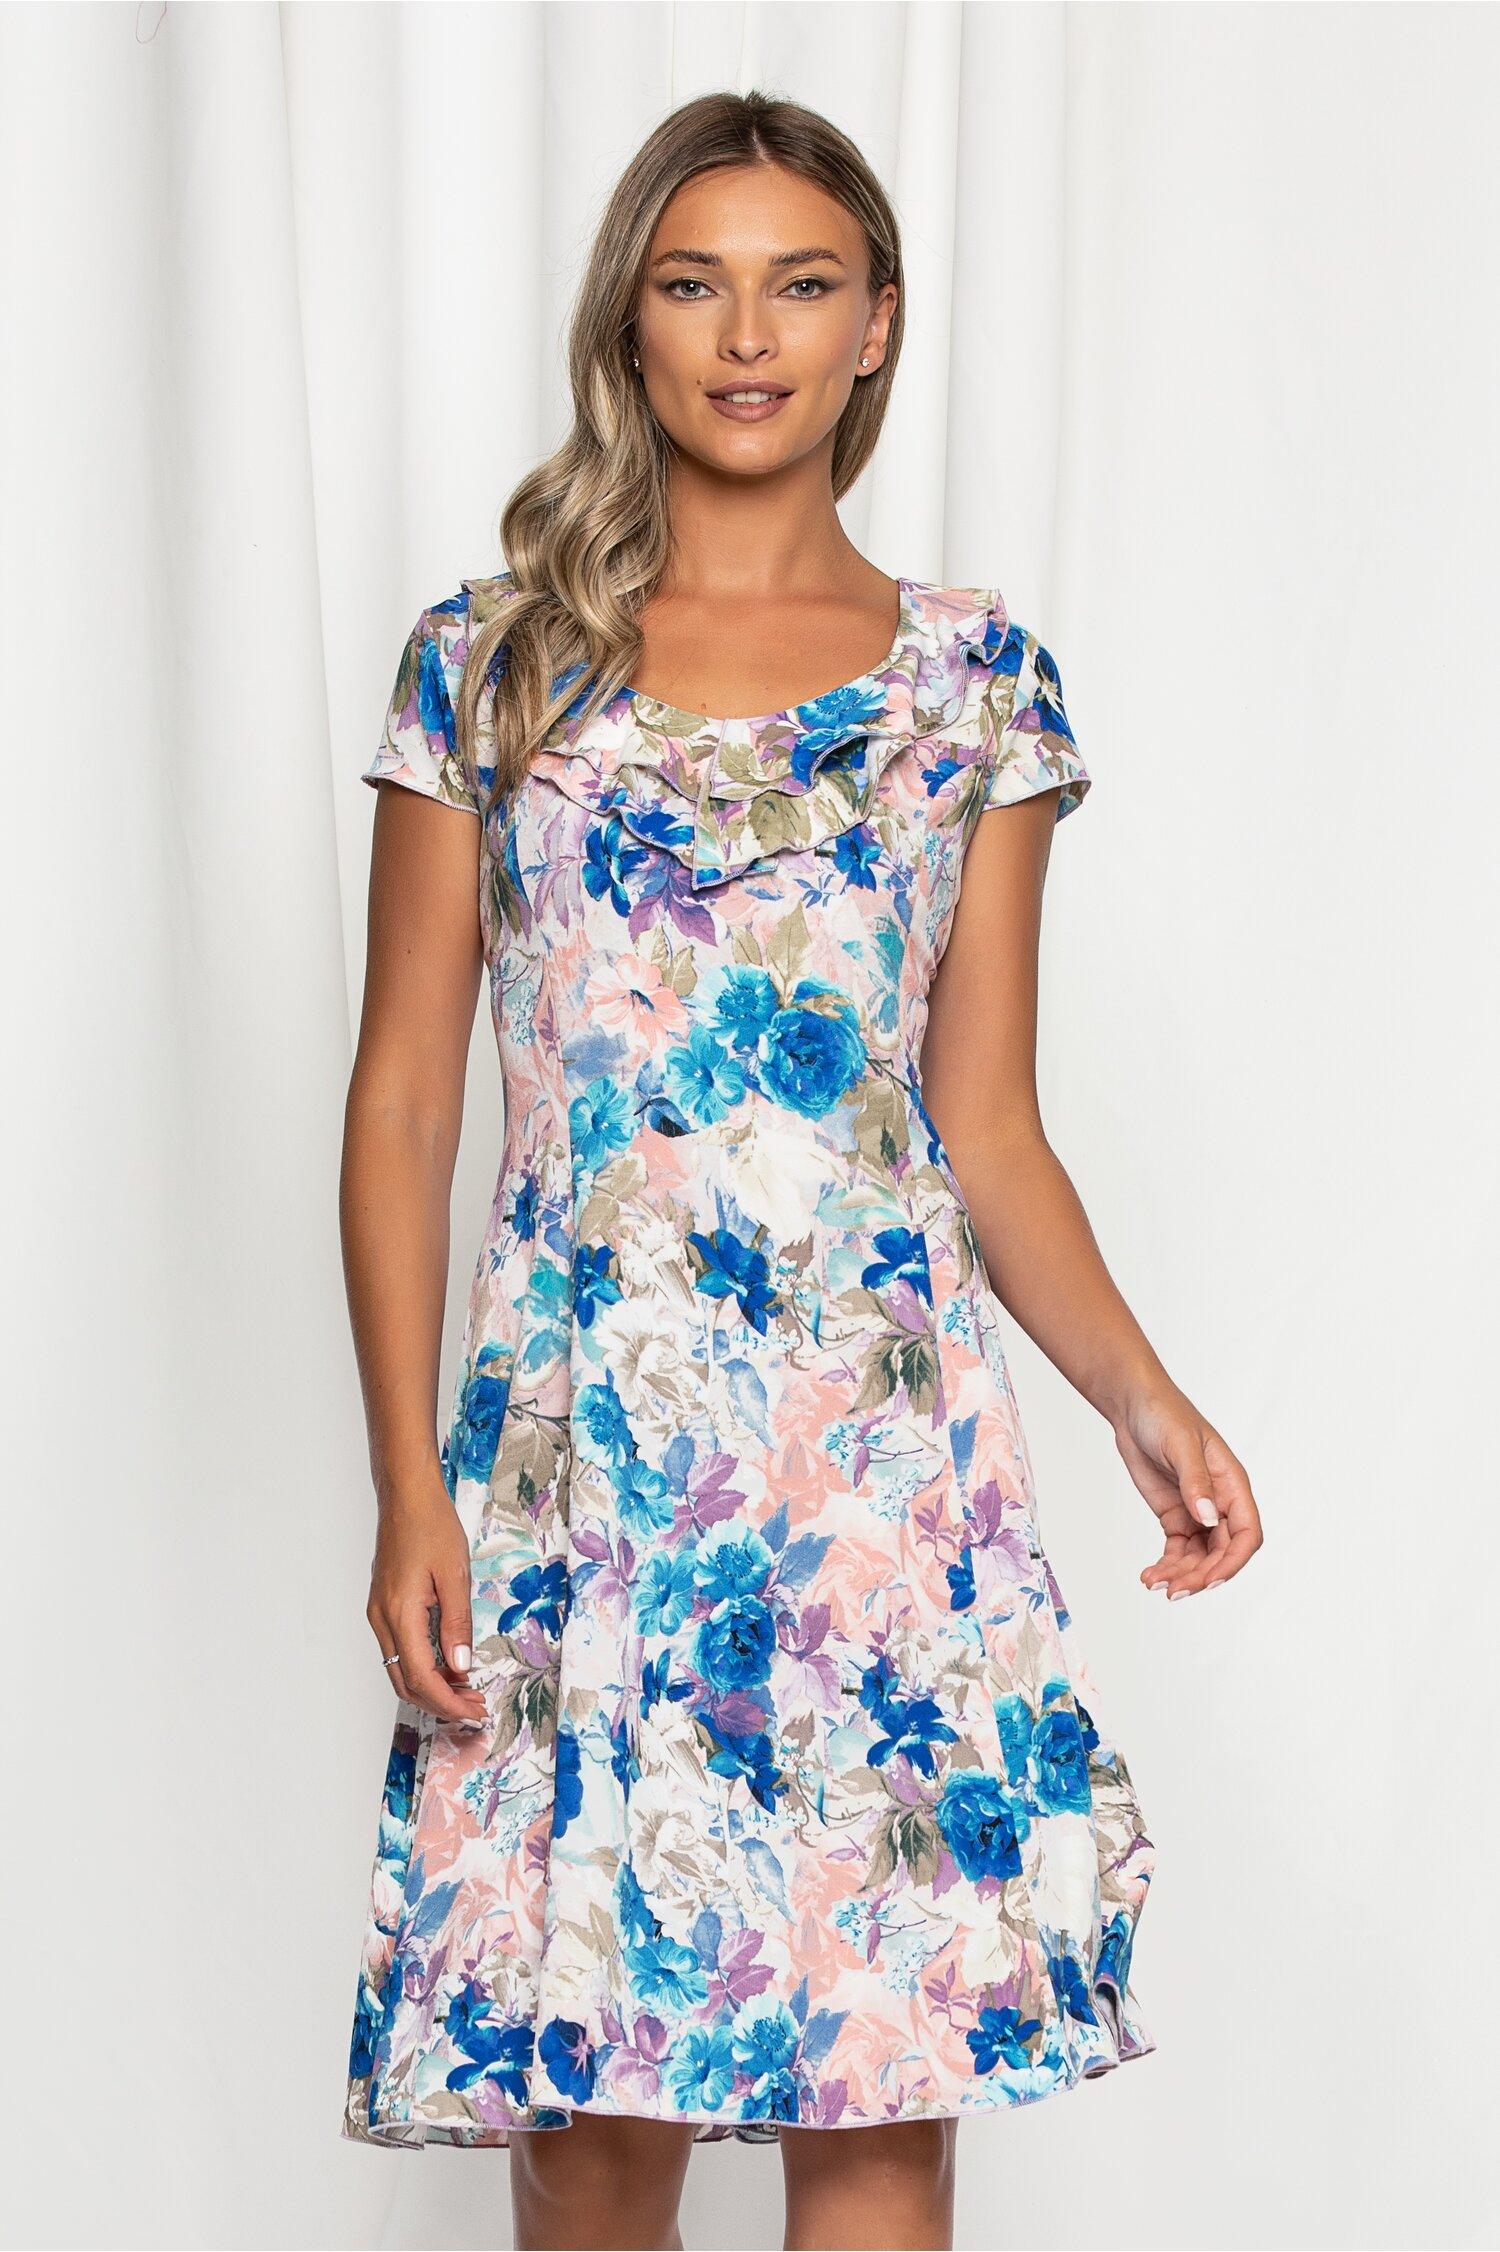 Rochie Kian cu imprimeu floral albastru si pasteluri